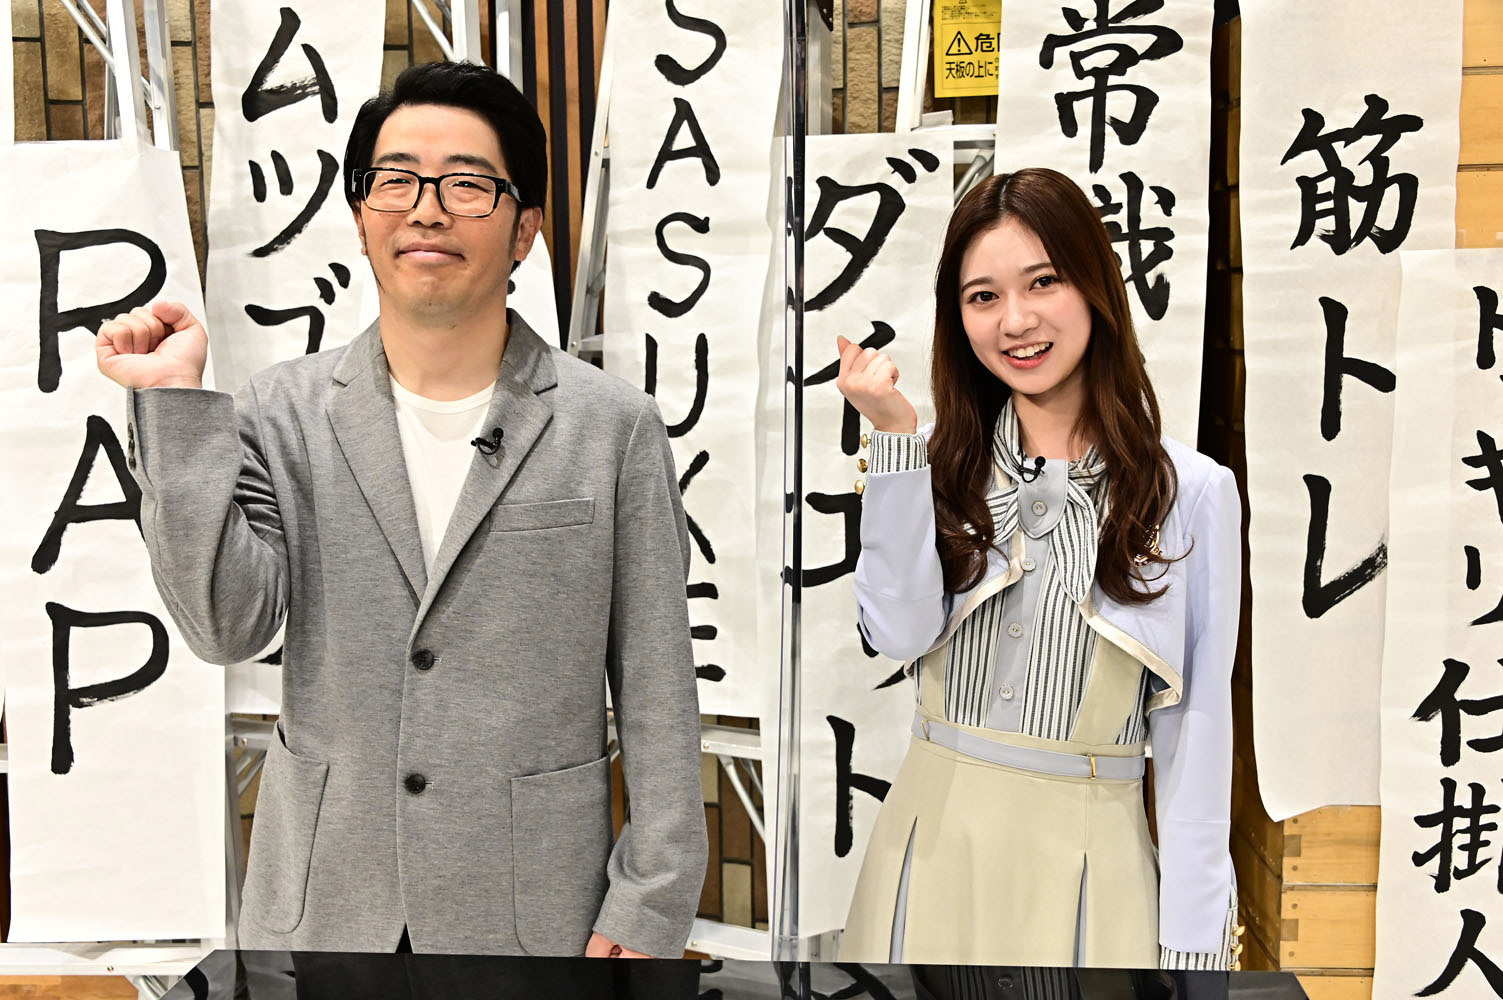 MCの寺田蘭世(右)と鈴木拓(左)(C)TBS